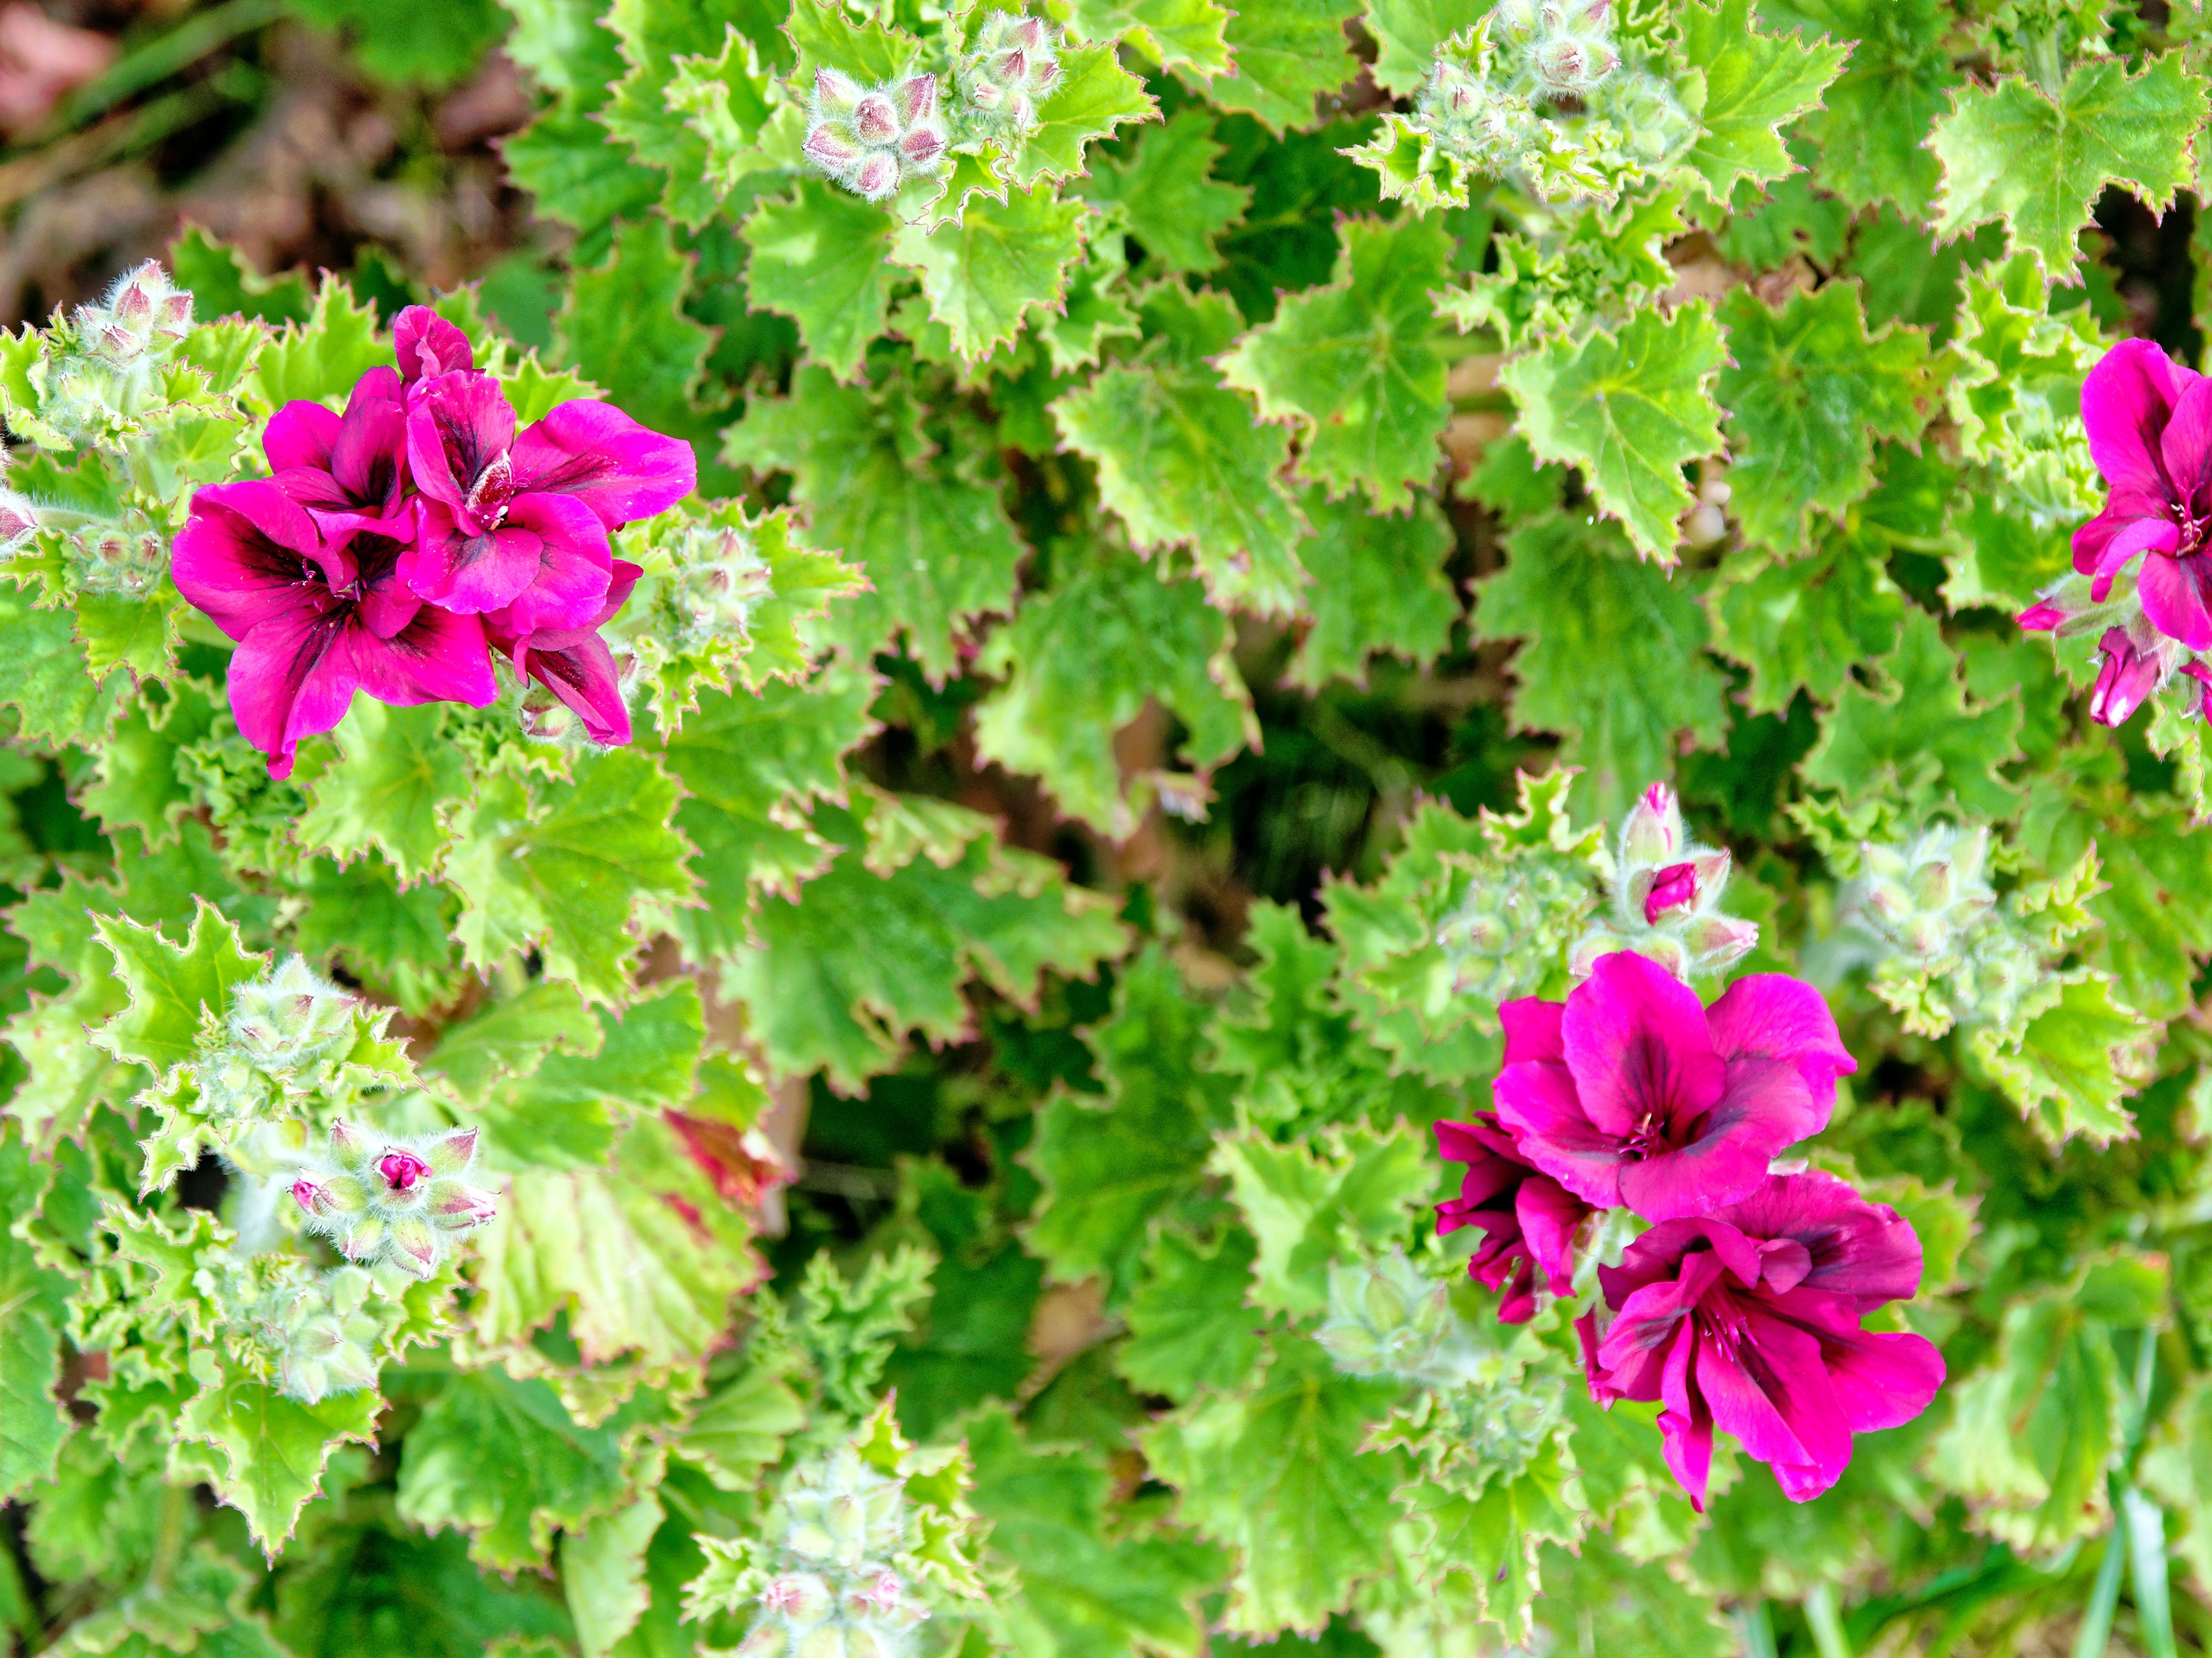 This should be Pelargonium.jpeg.  Is it missing?